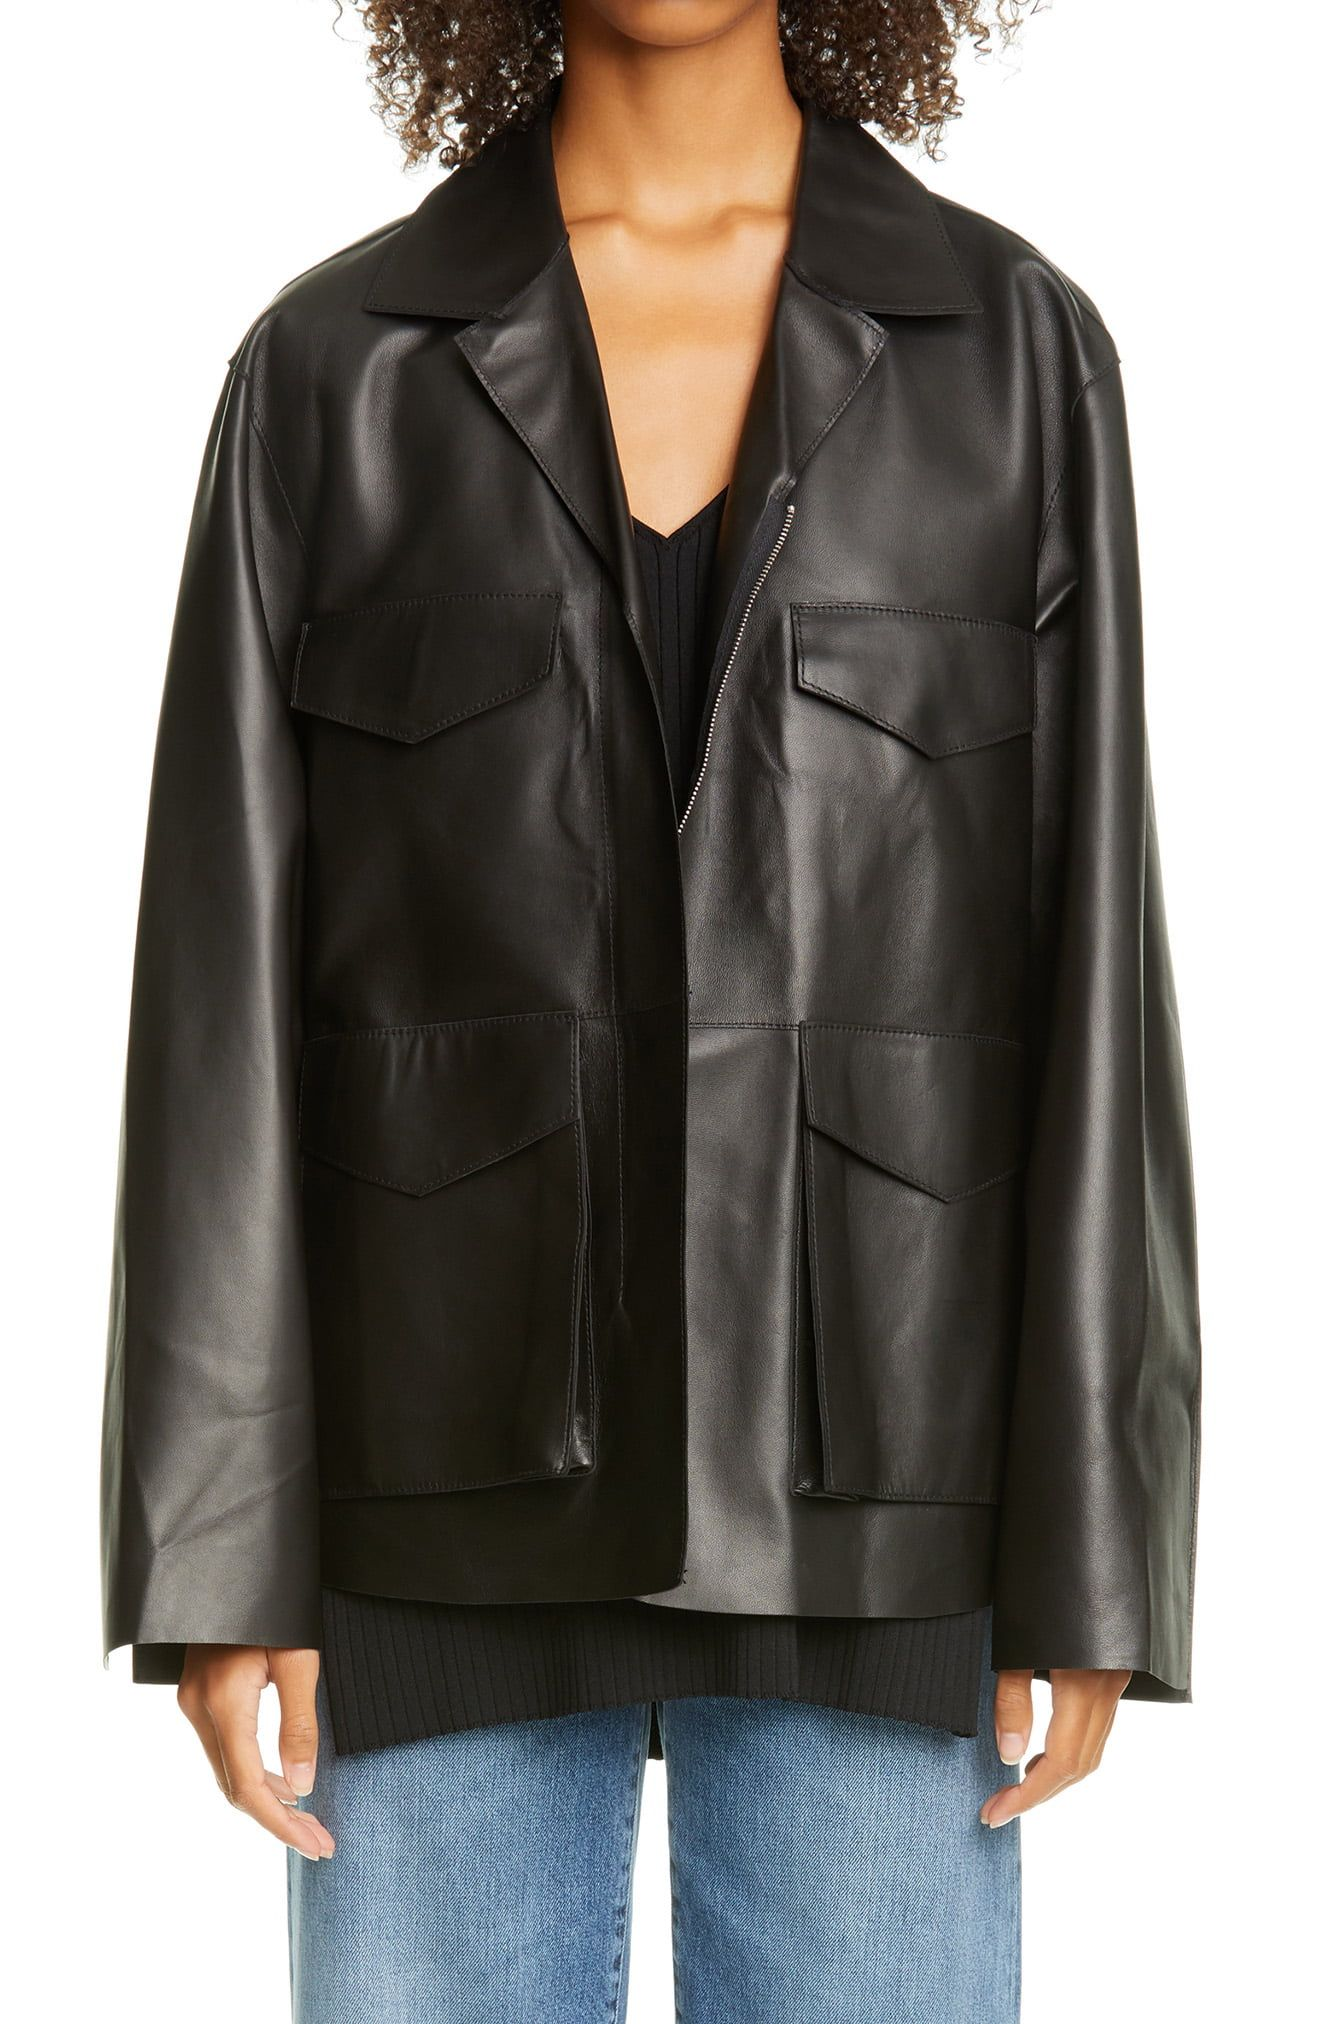 Toteme Avignon Oversize Leather Jacket Nordstrom Leather Jacket Celebrities Leather Jacket Jackets [ 2024 x 1320 Pixel ]